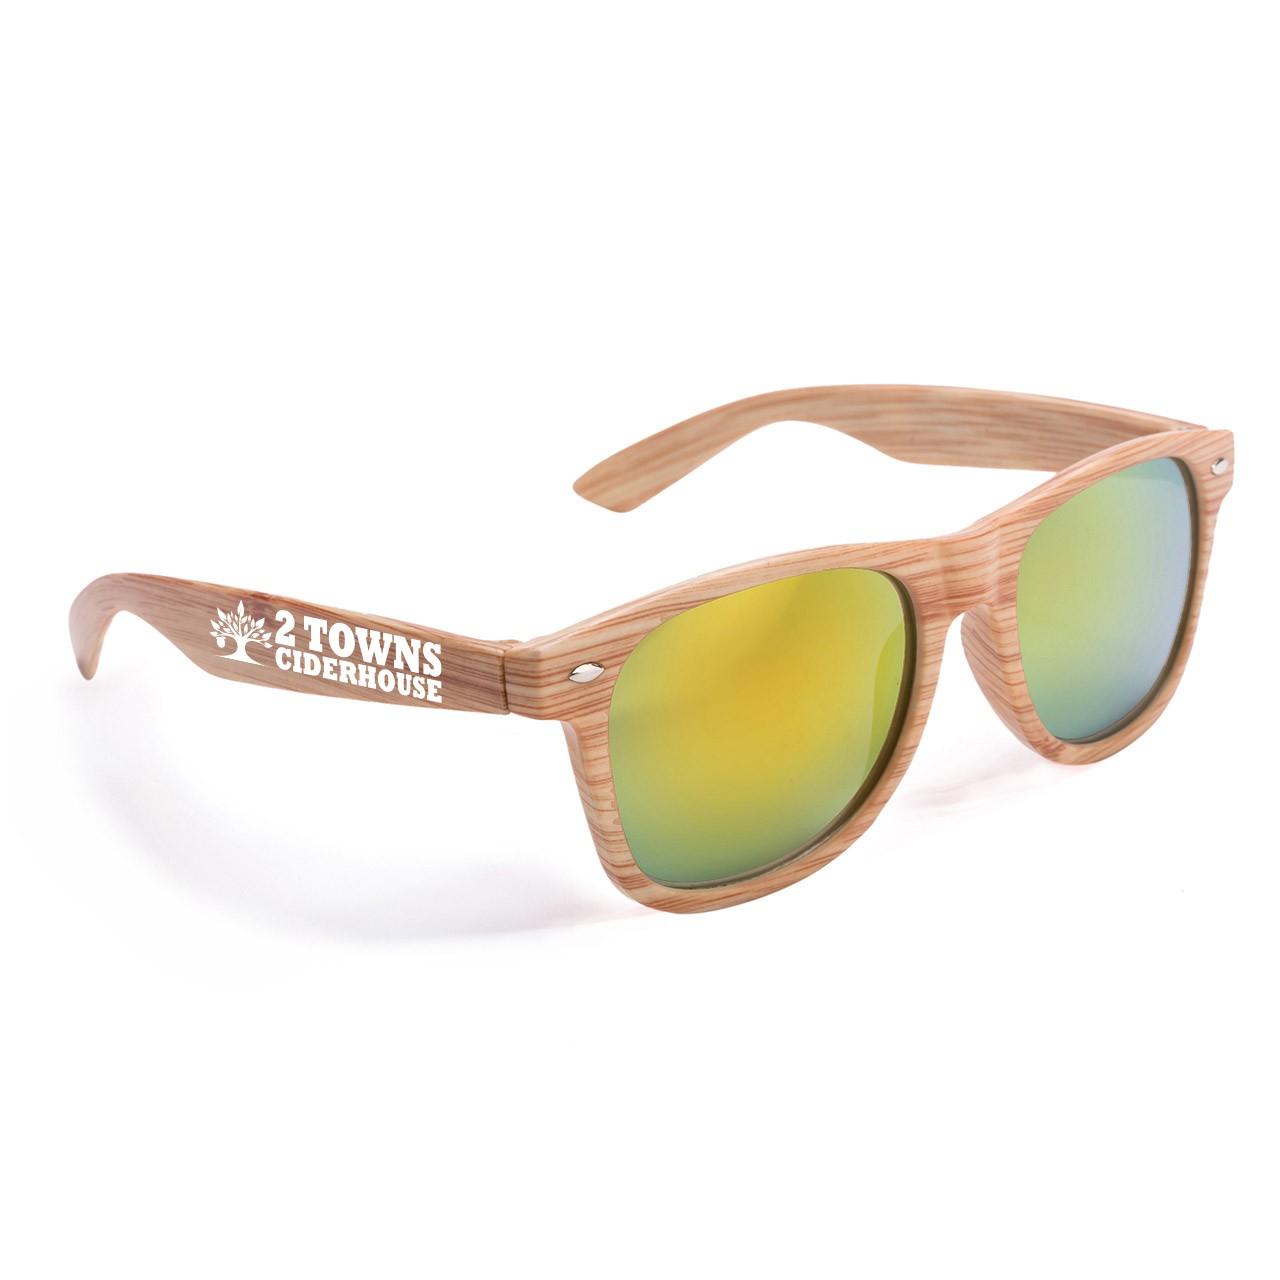 Custom Printed Wood Grain Sunglasses